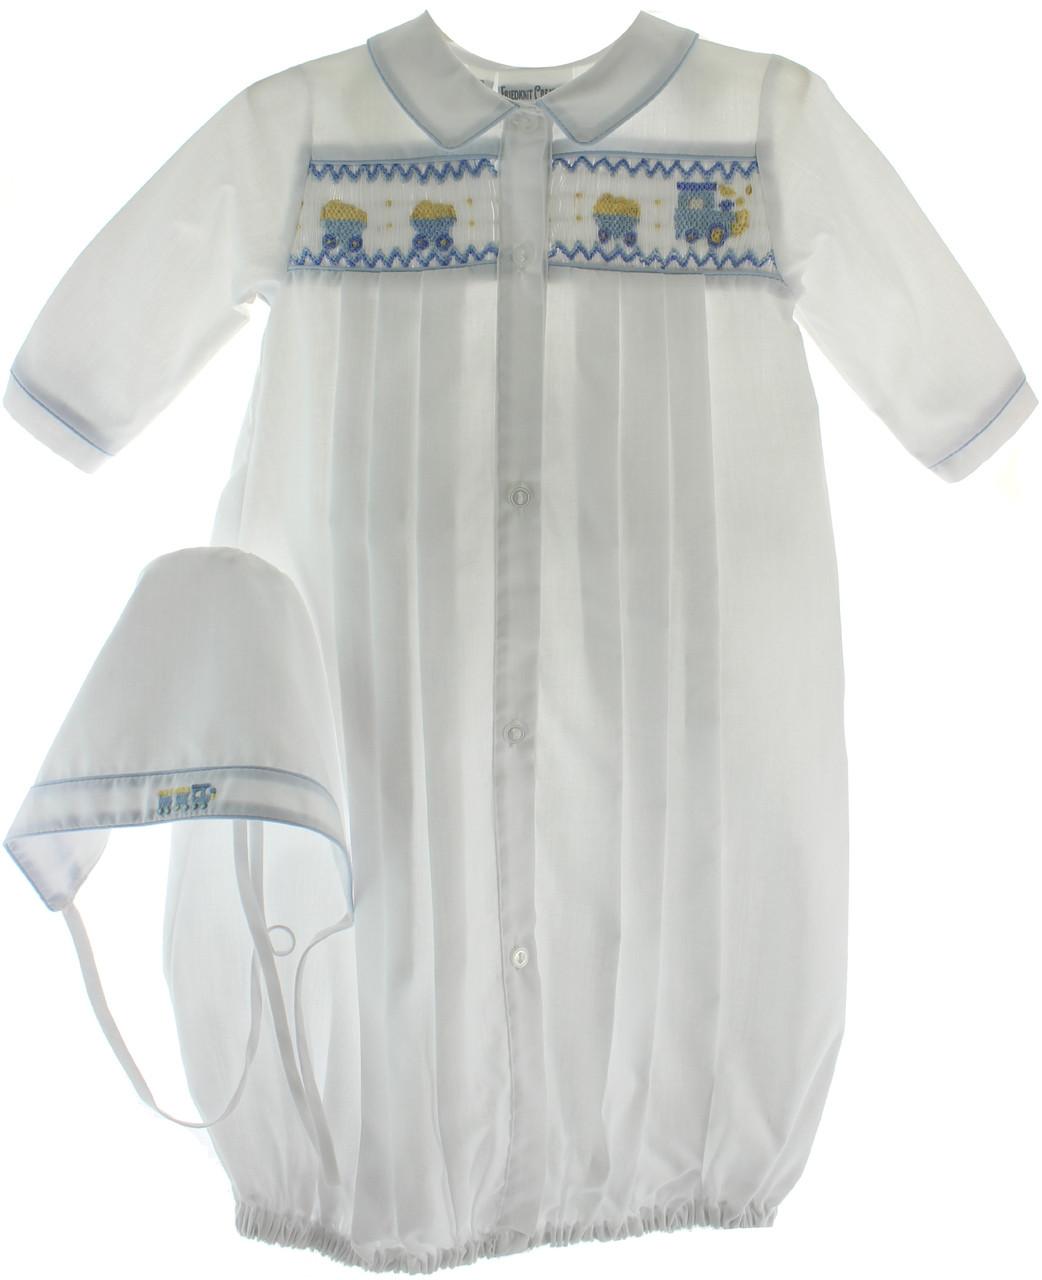 b069924935687 Newborn Boy Take Home Outfit White Gown Blue Train Smocking & Bonnet